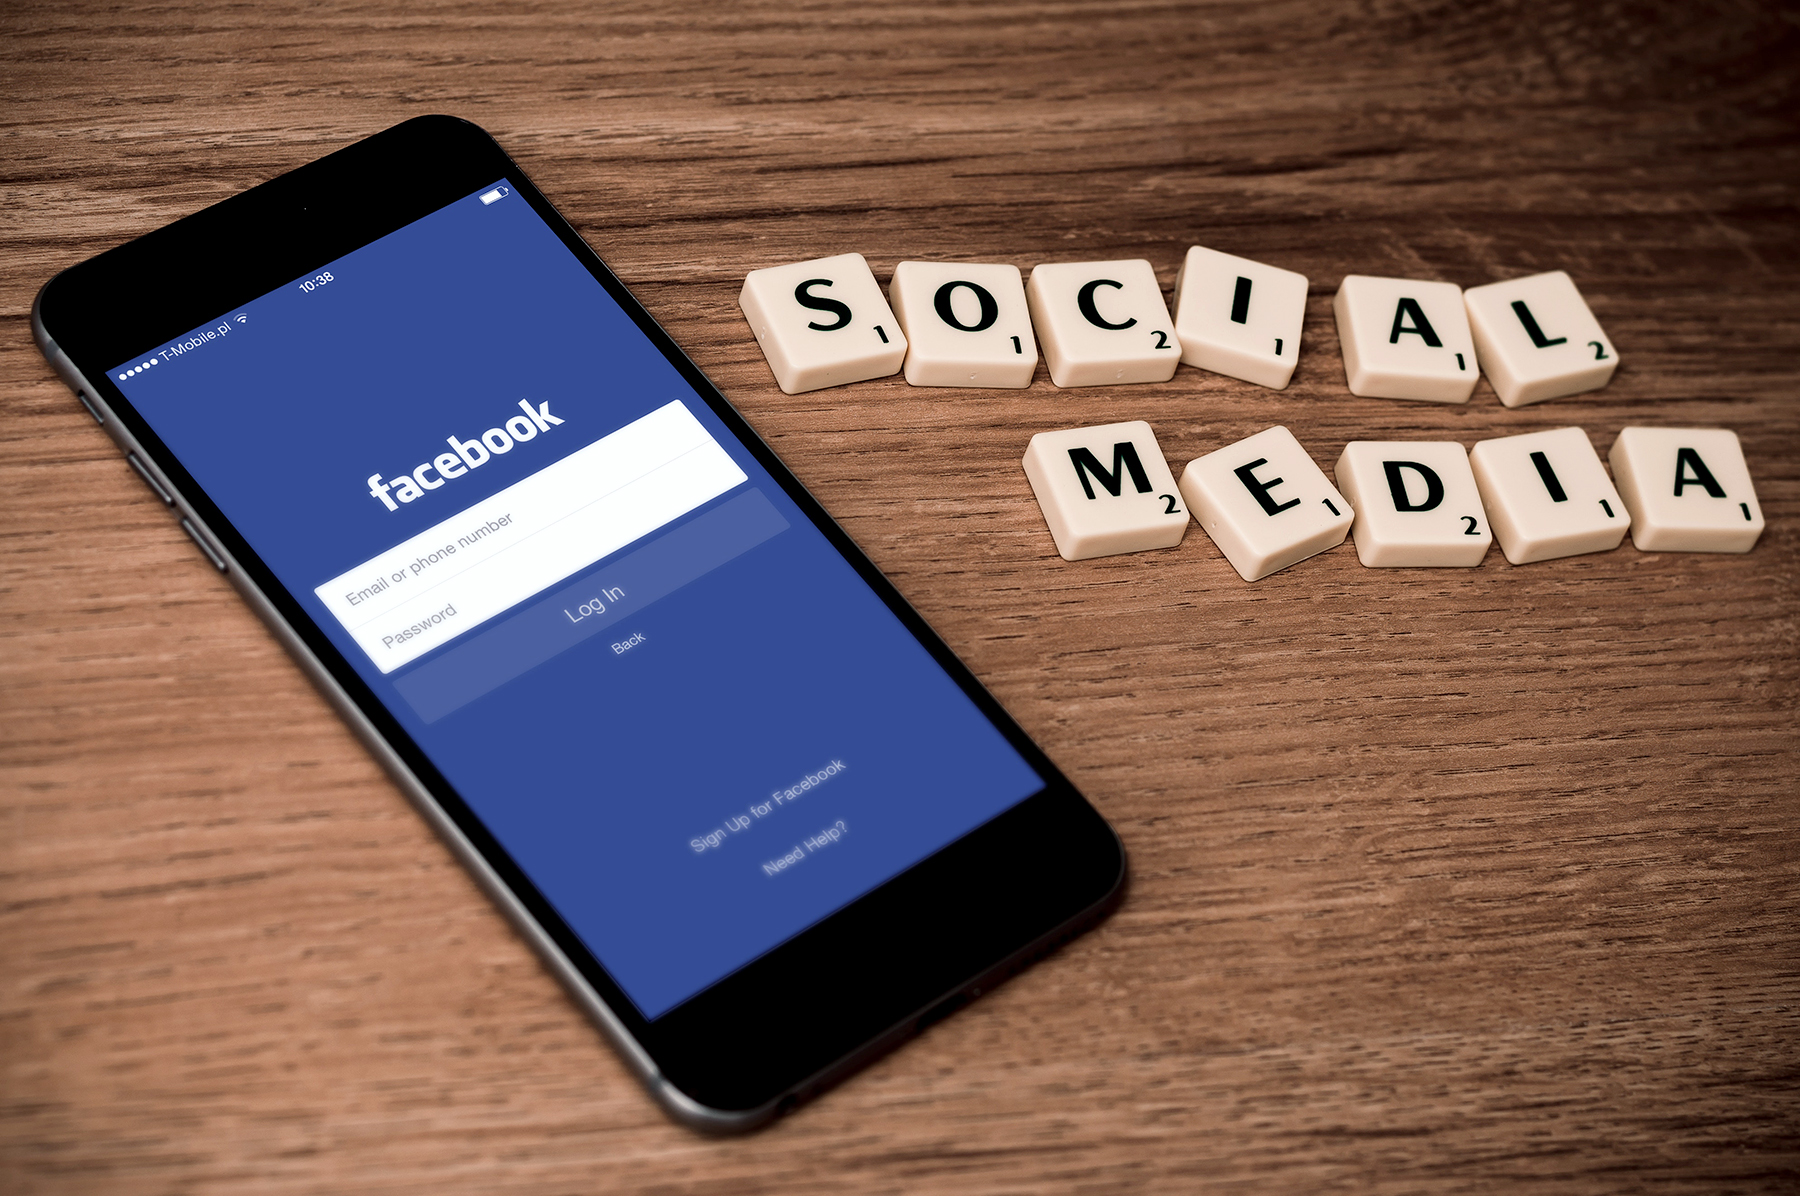 Social media, mobile Facebook app on phone